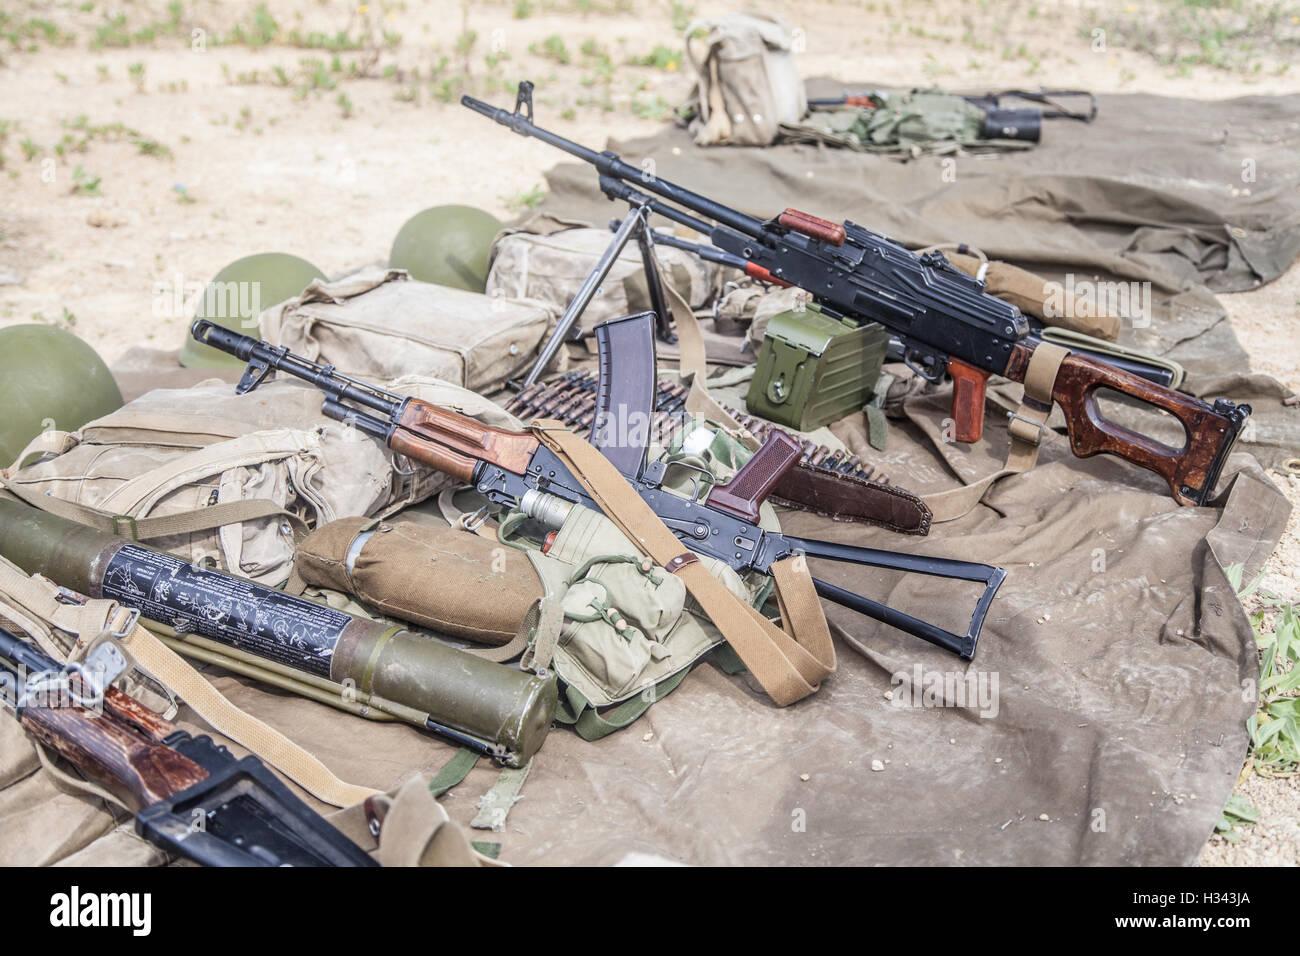 Soviet Afghanistan war - Page 6 Before-a-mission-H343JA